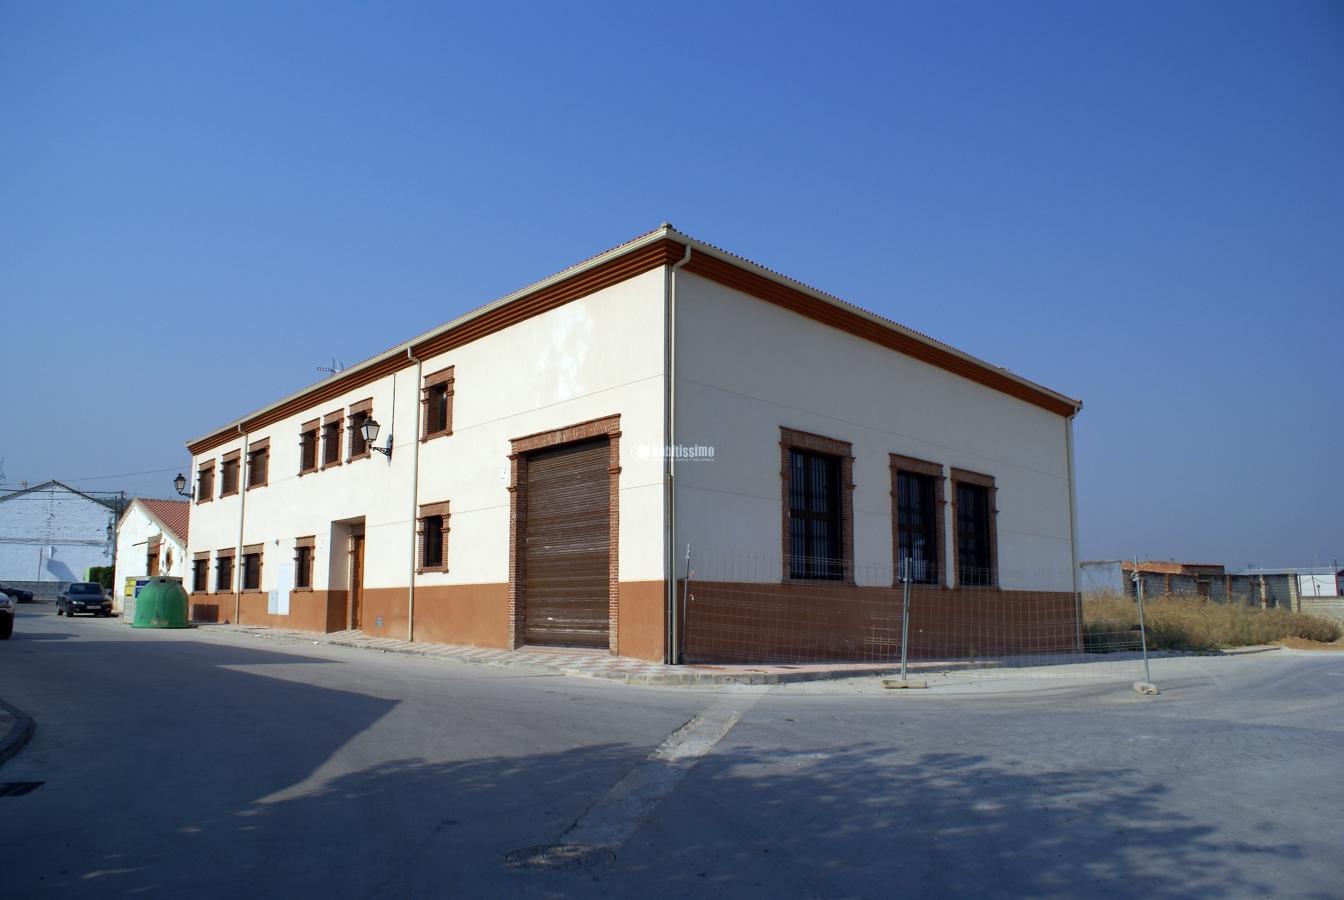 Foto arquitectos de garquitectos 60594 habitissimo - Listado arquitectos valencia ...